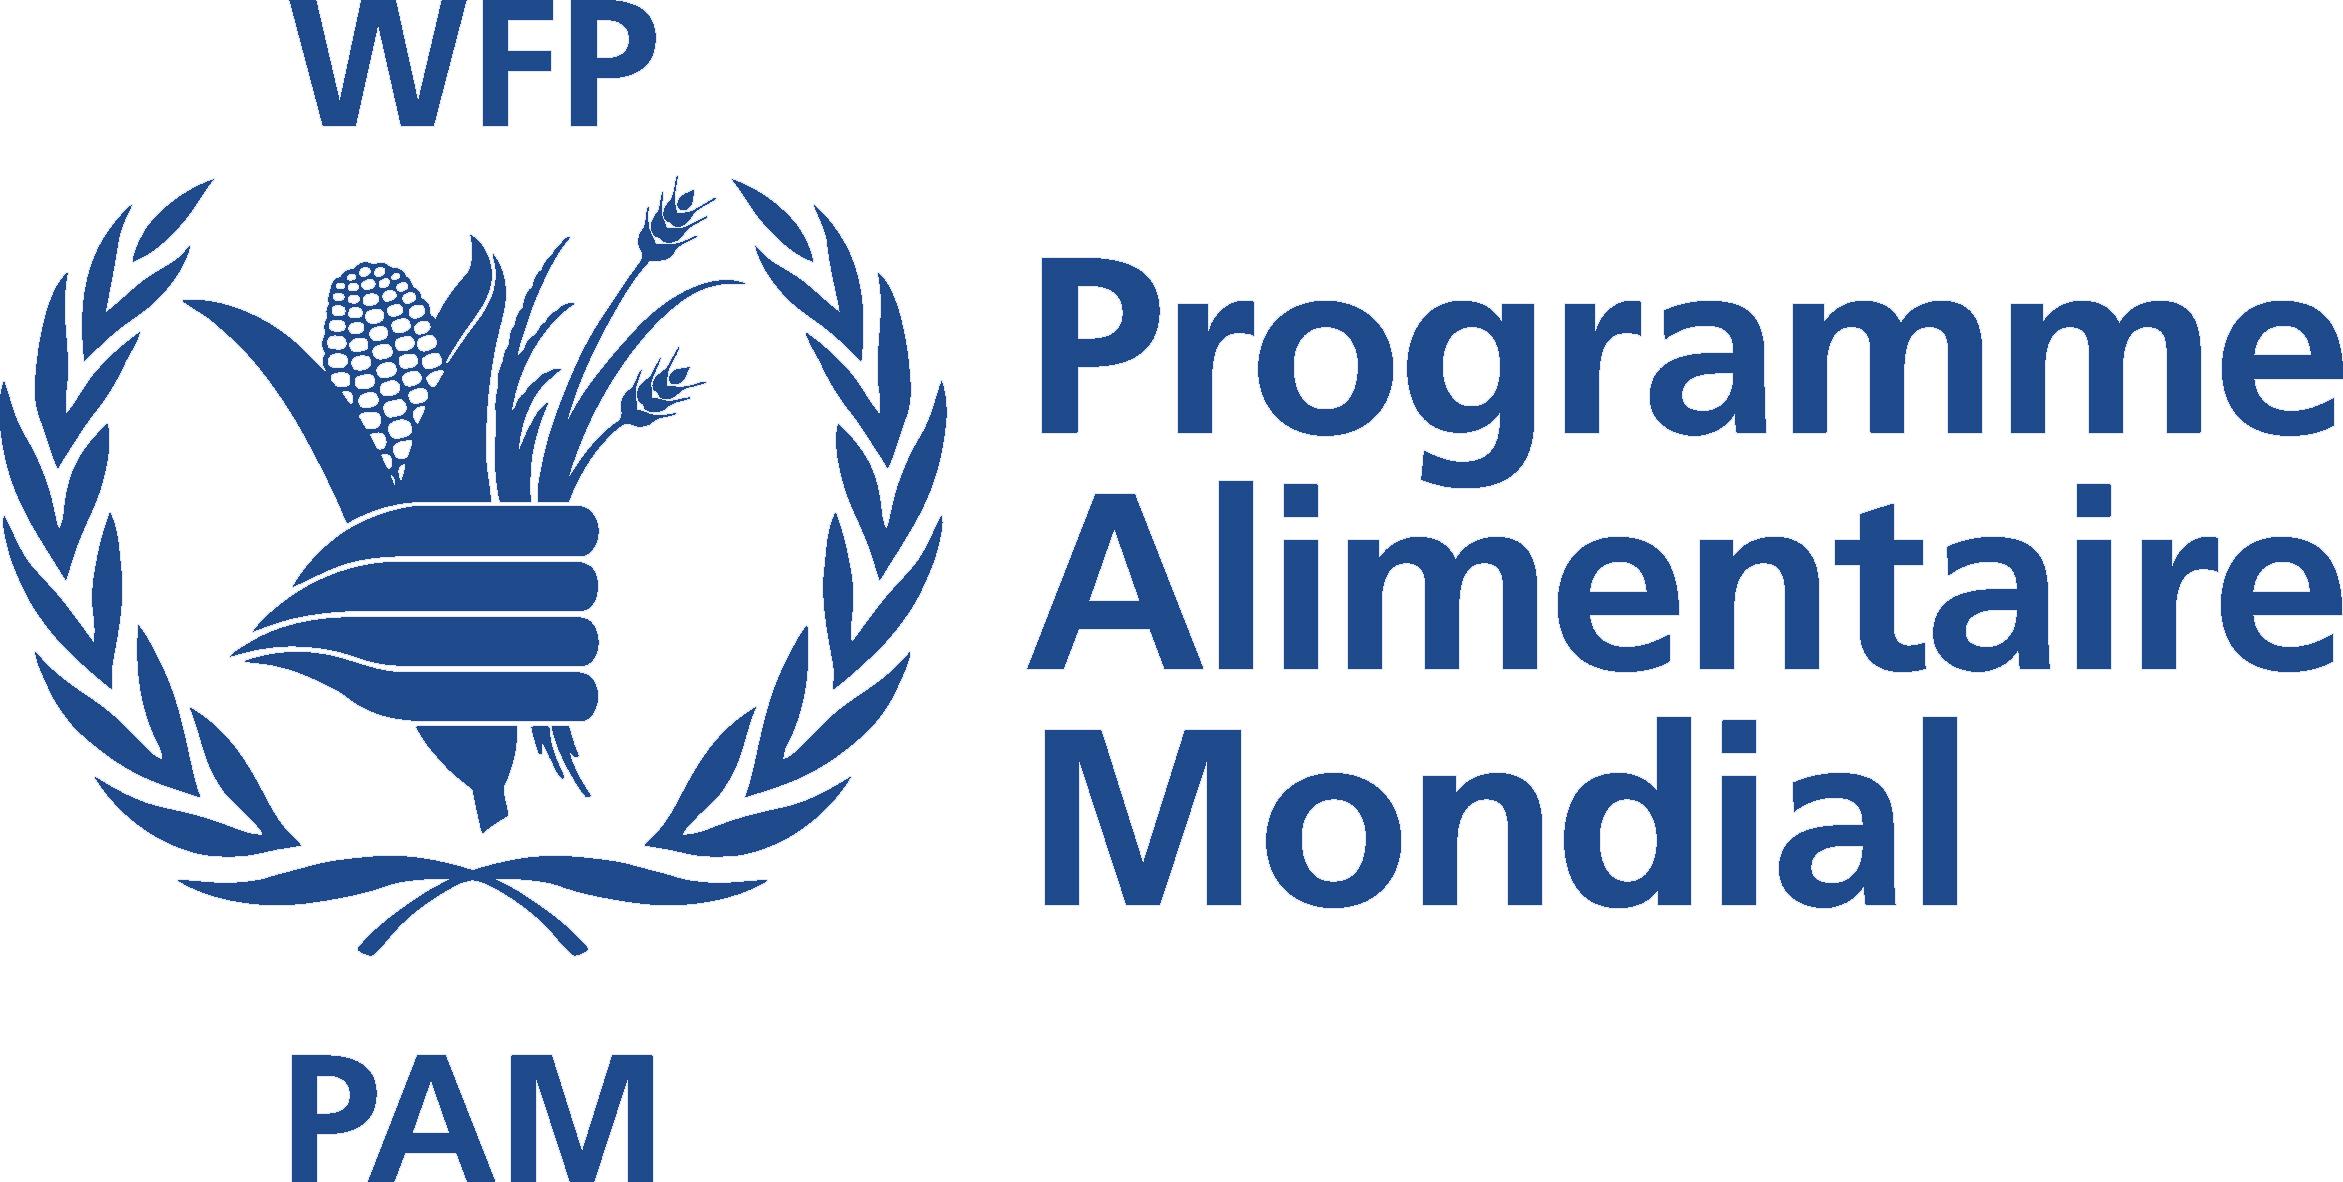 Programme Alimentaire Mondial